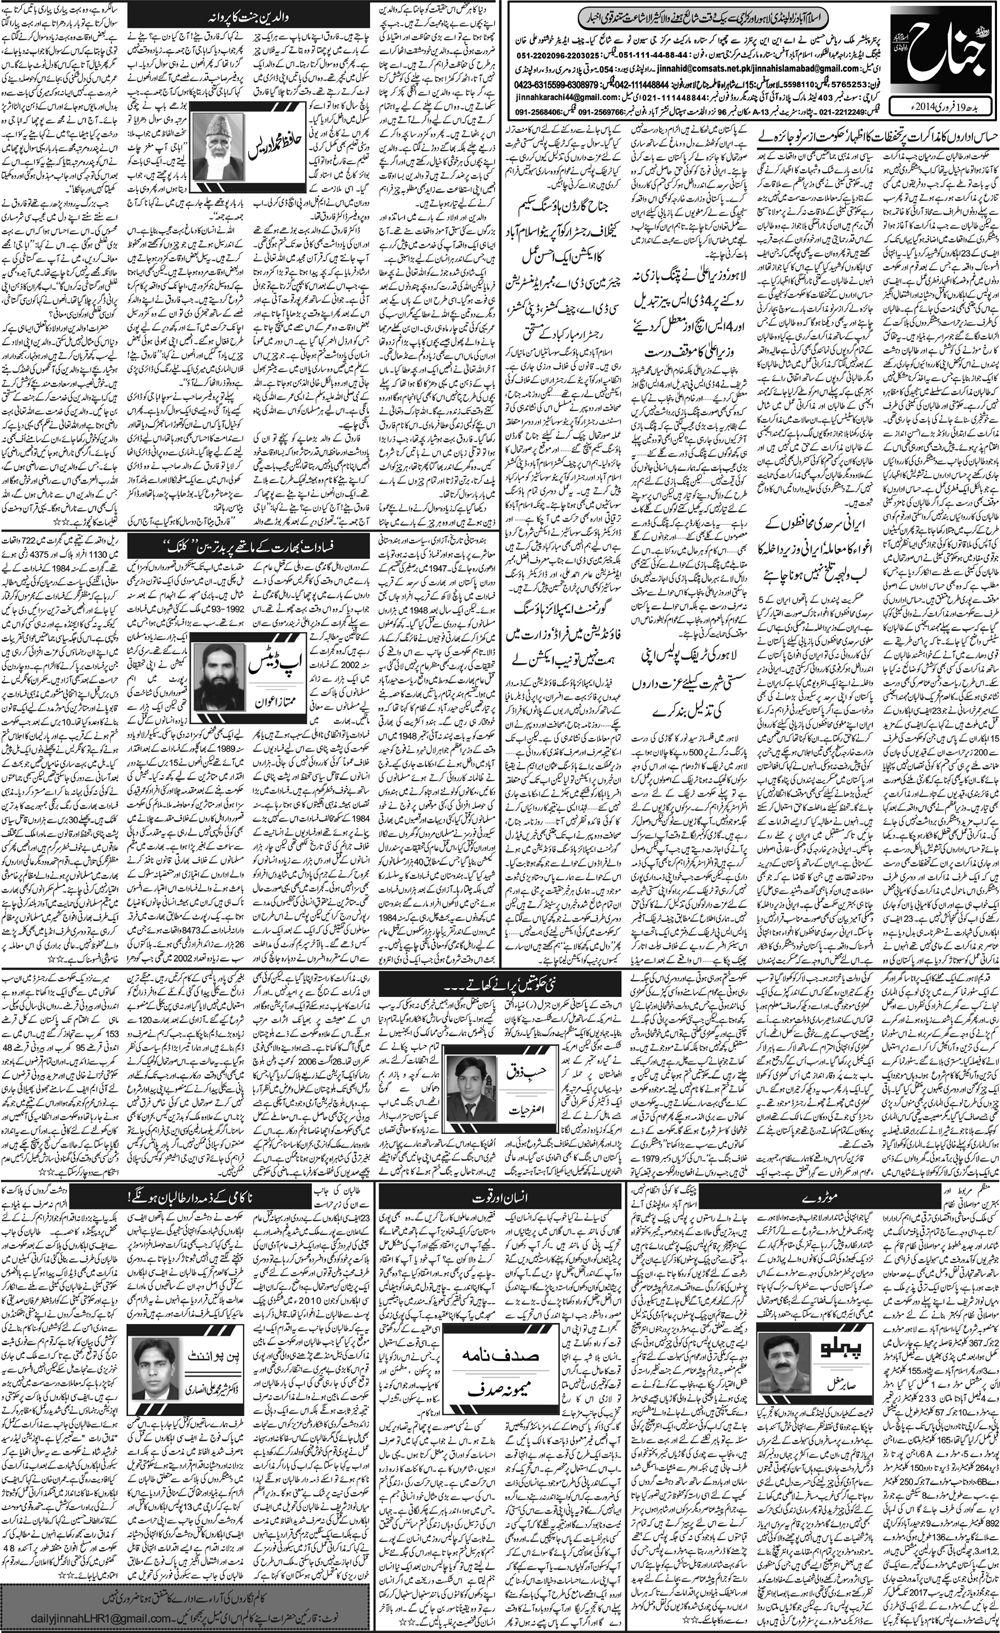 Pin by Maemuna Sadaf on published in news paper URDU